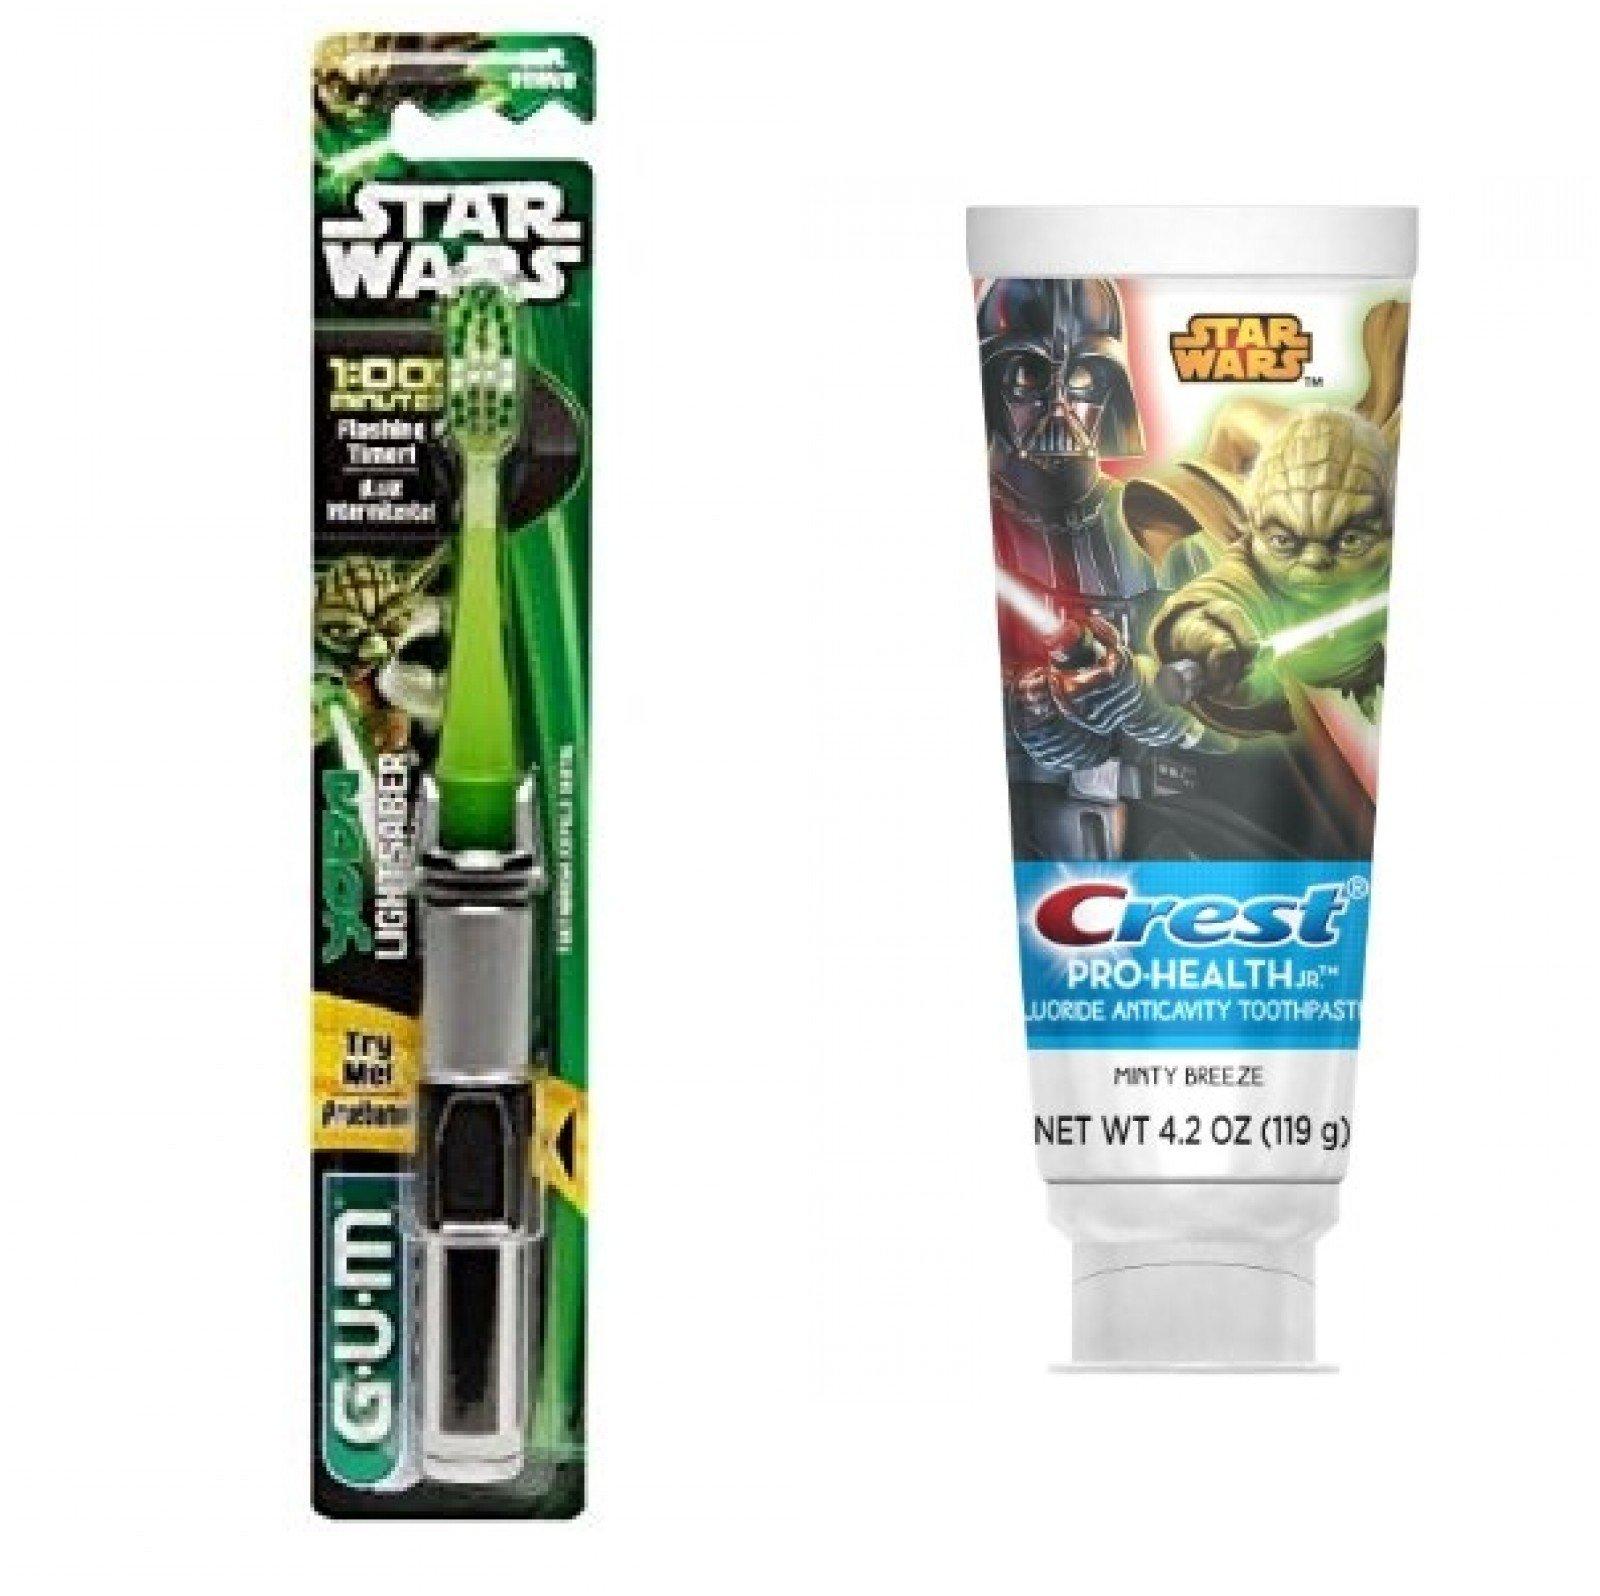 Gum Star Wars YODA Powered Light Up Lightsaber Soft Toothbrush + Crest Pro-Health Disney Star Wars Kids Minty Breeze Toothpaste, 4.2 Oz